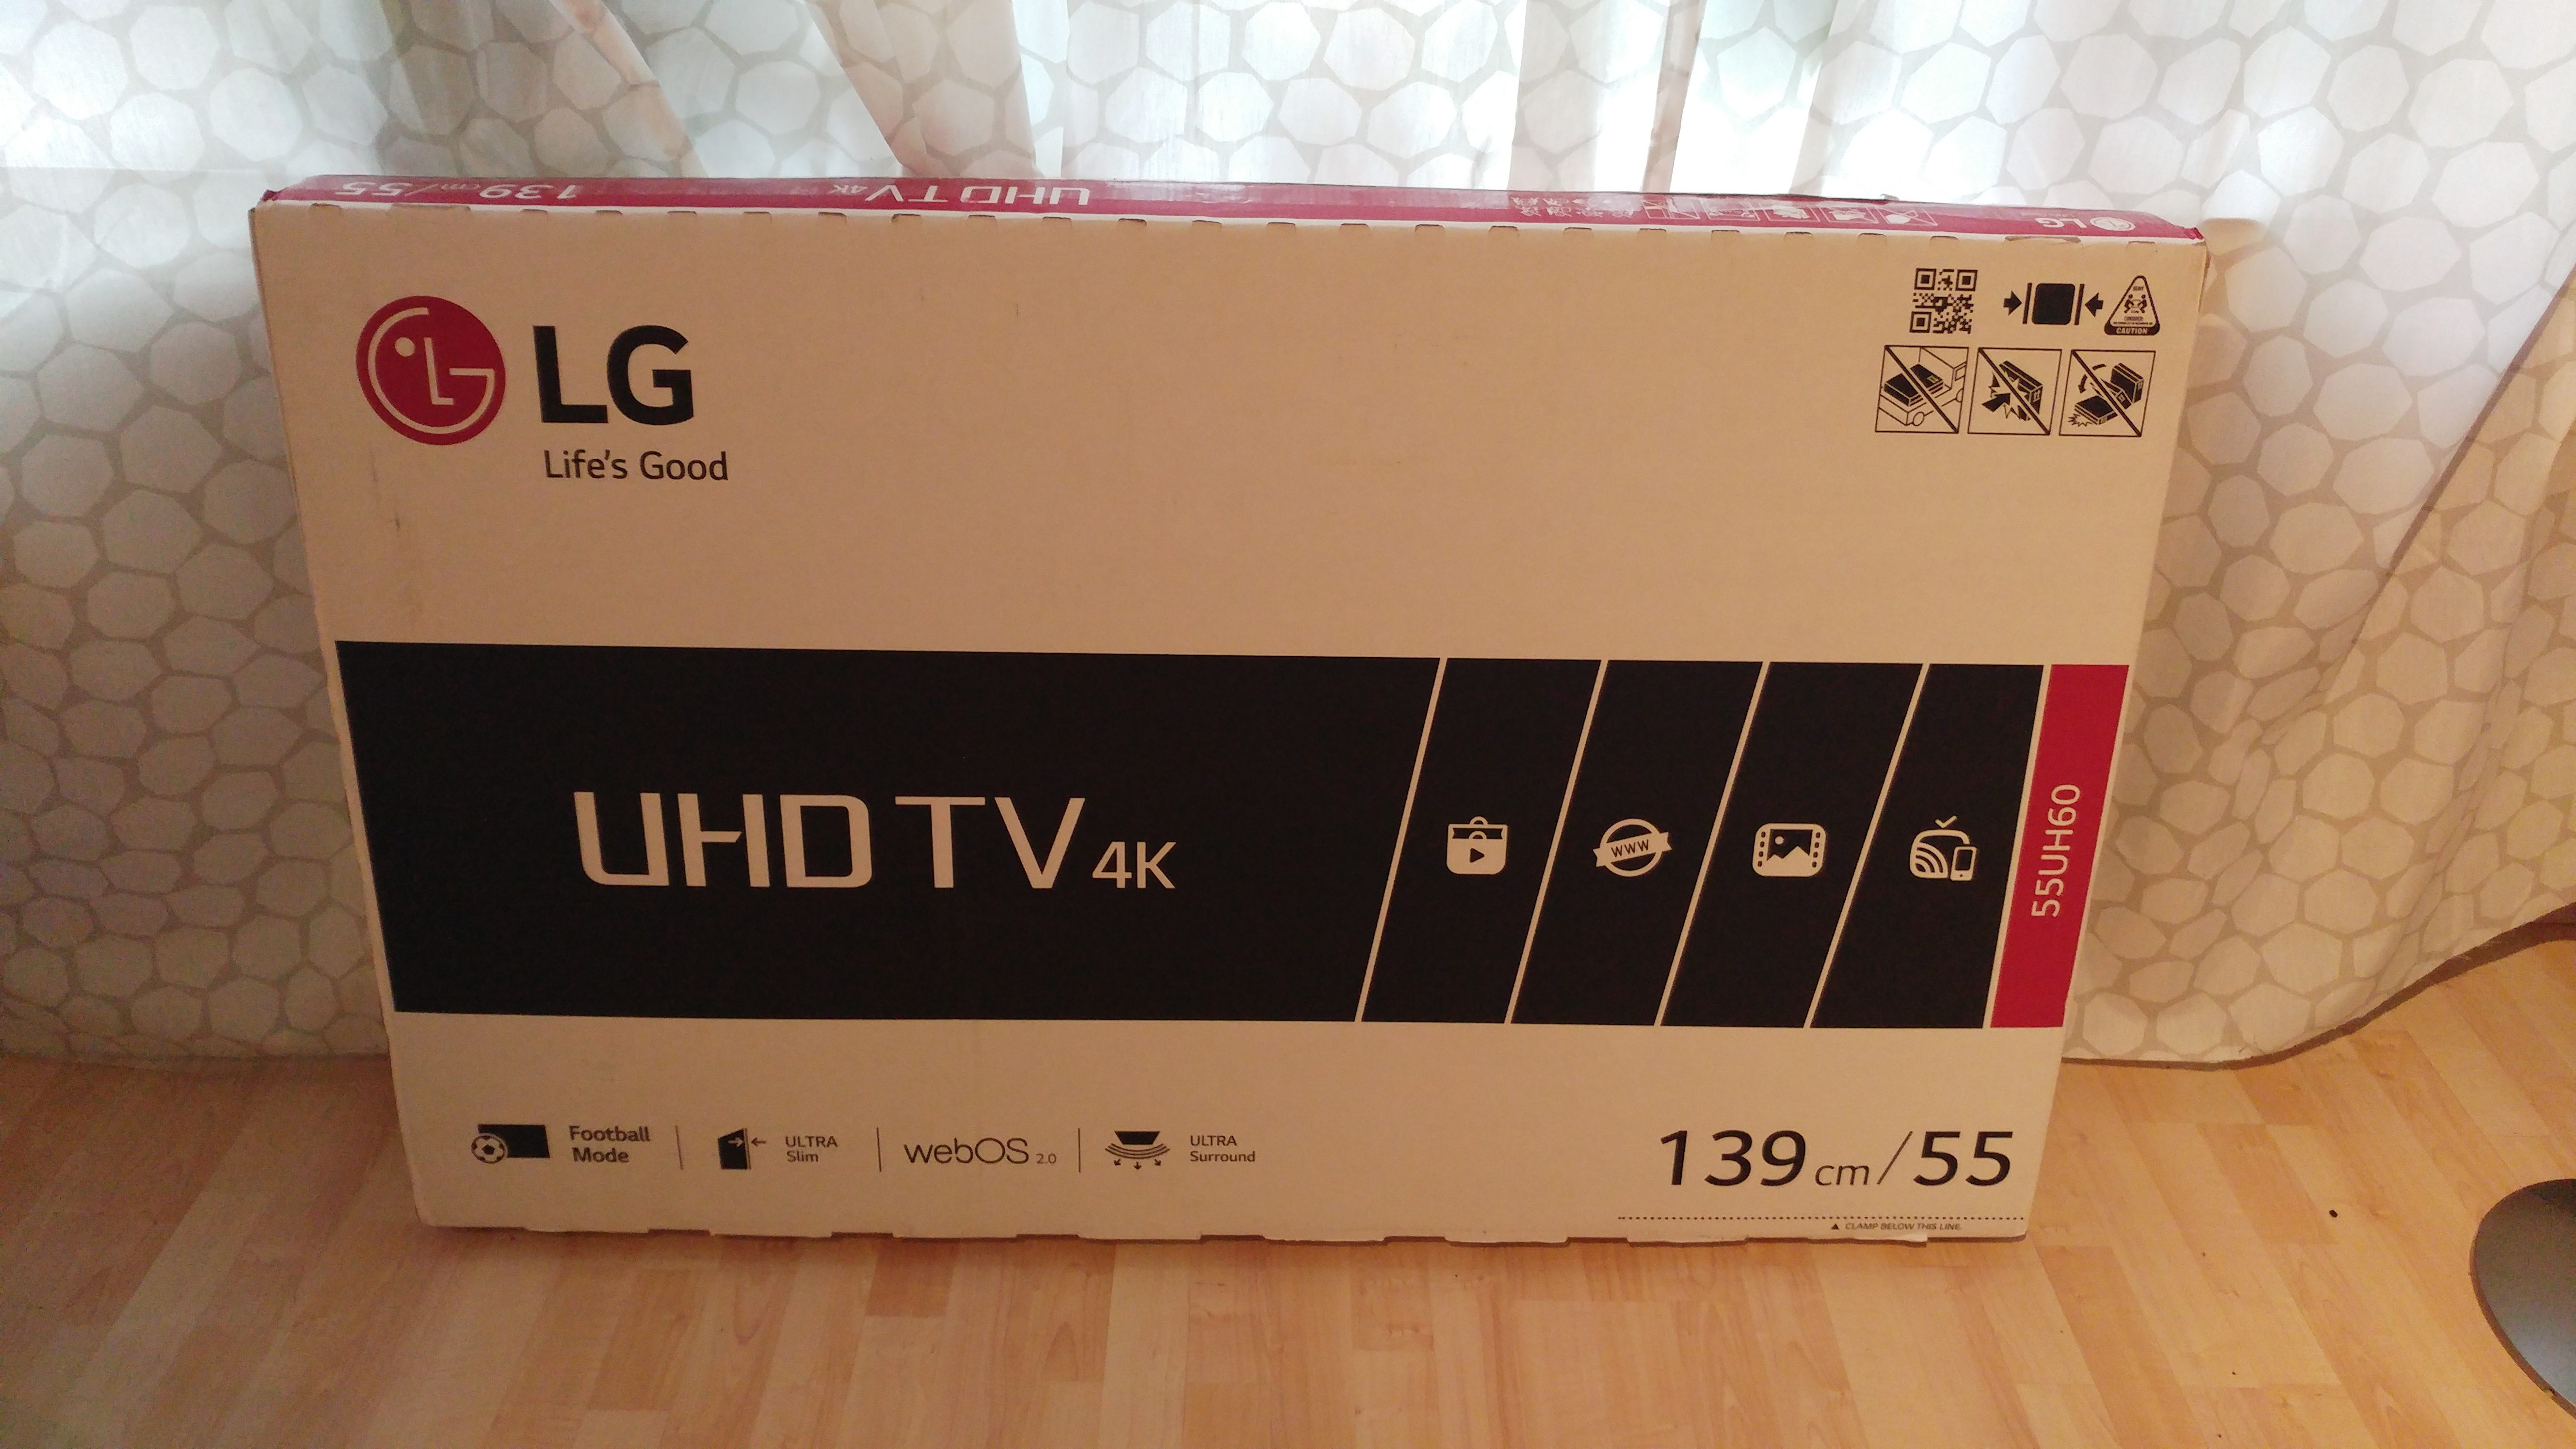 testbericht lg 55uh600v uhd tv ausgepackt und angeschlossen teil 1. Black Bedroom Furniture Sets. Home Design Ideas